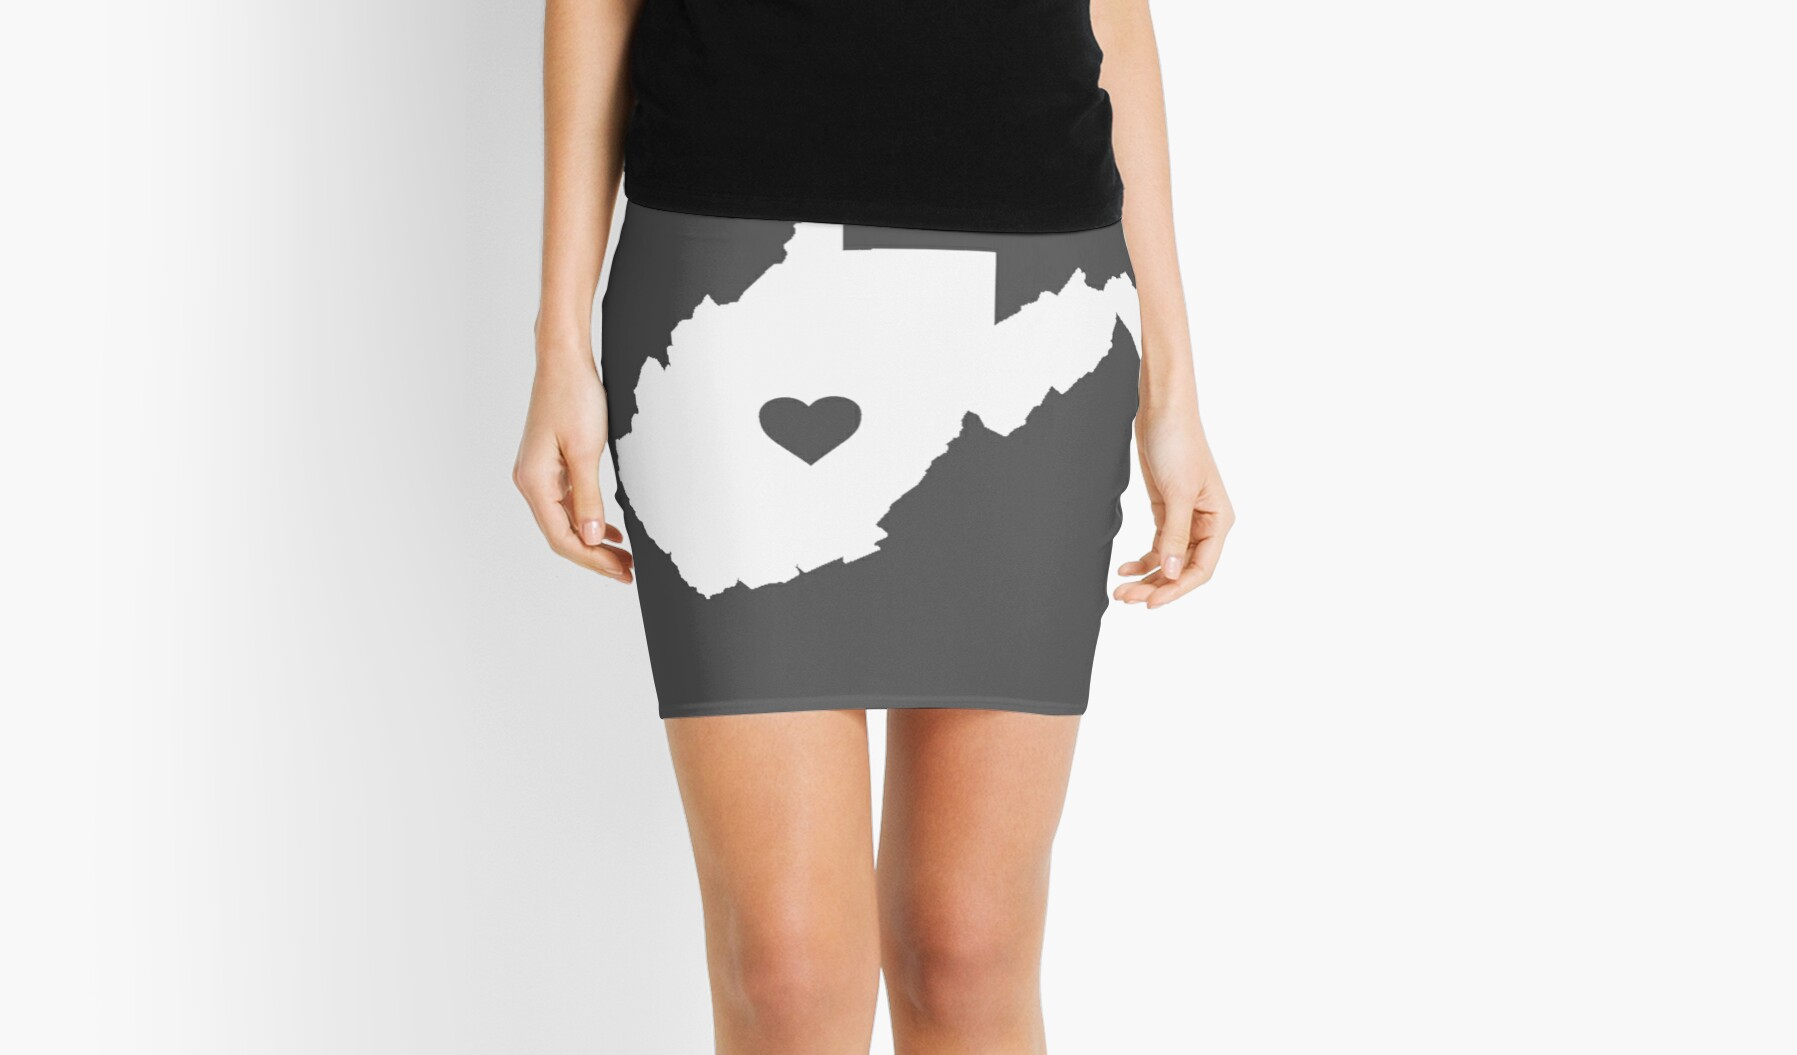 West Virginia Heart by Rjcham